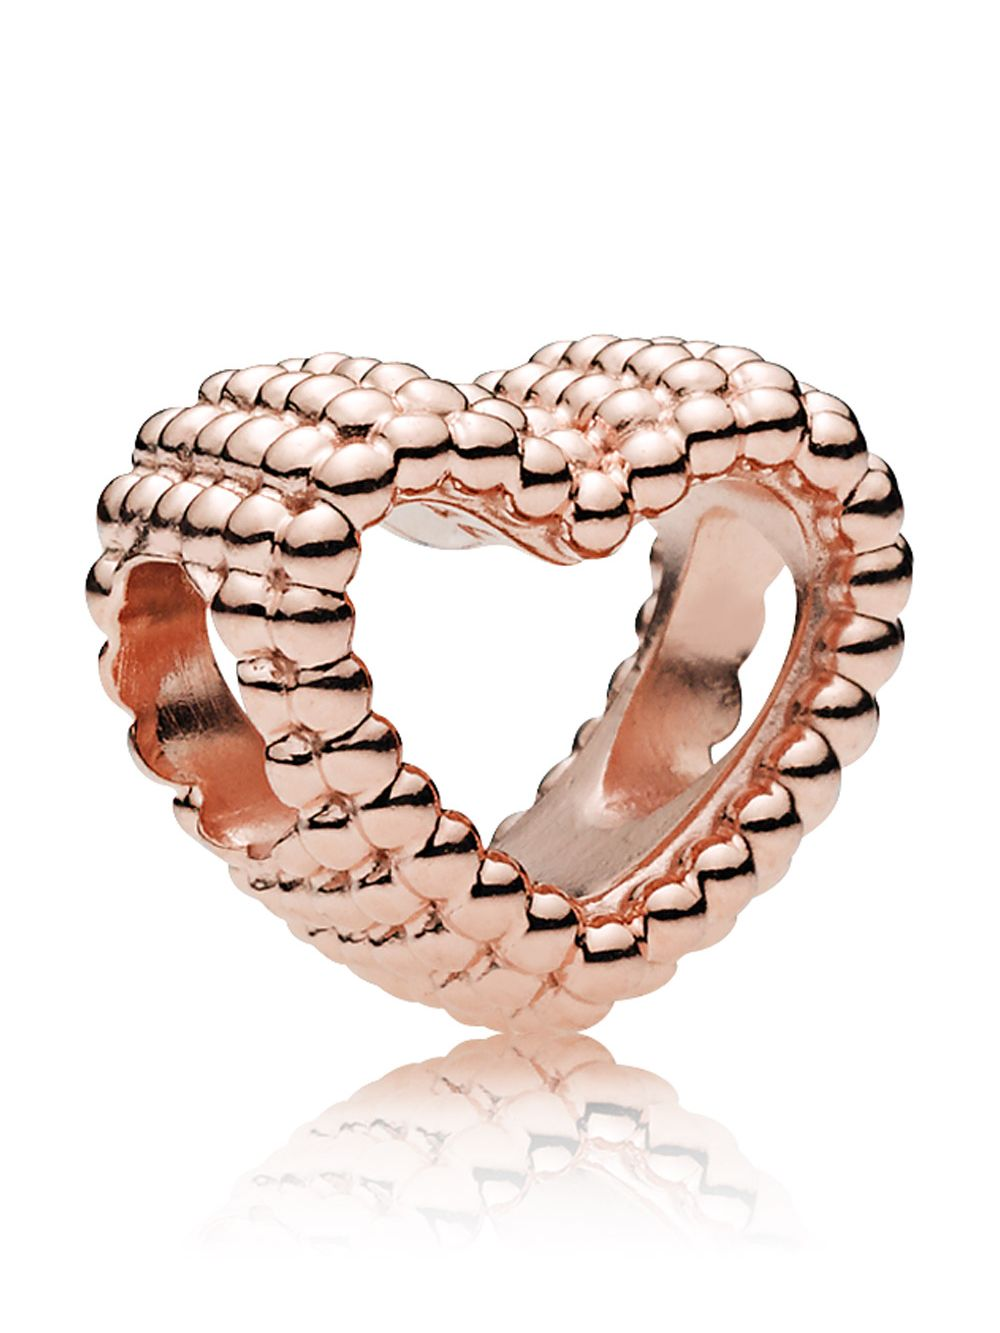 19d4df558 Pandora 787516 Rose Beaded Heart Charm Image 1 ...